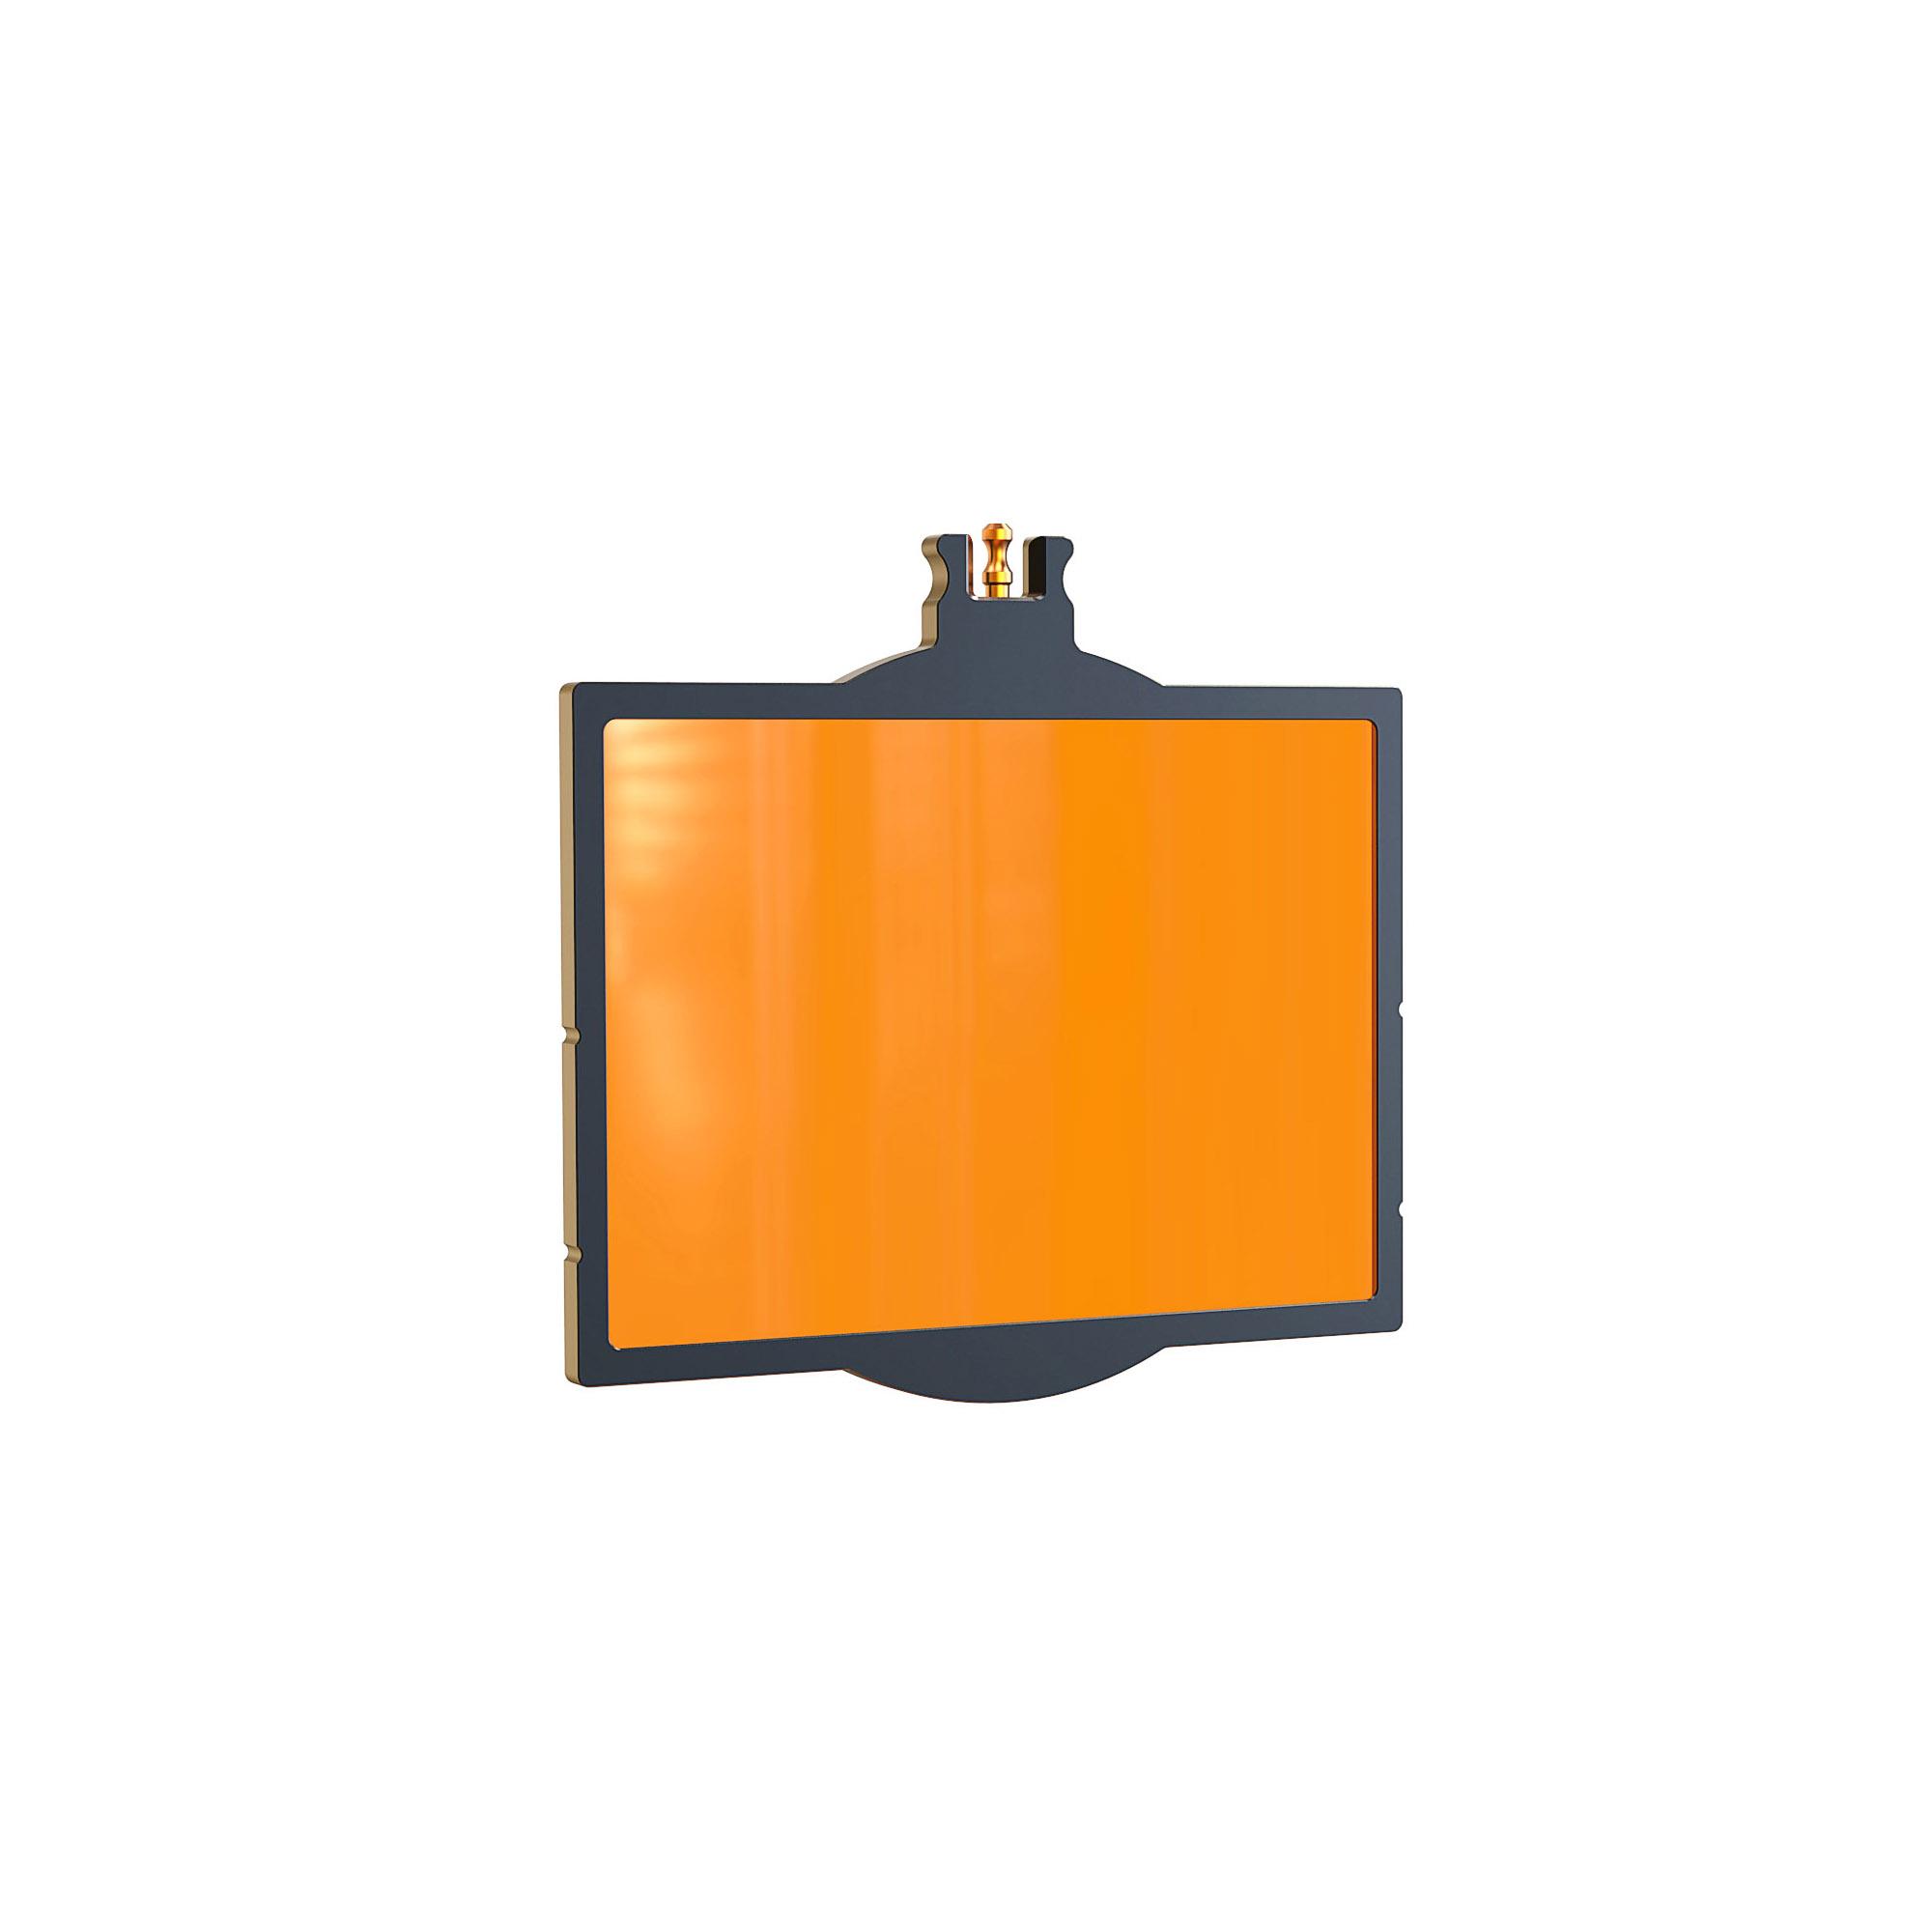 b1251.1010   misfit   4 x 5.65   filter tray   1